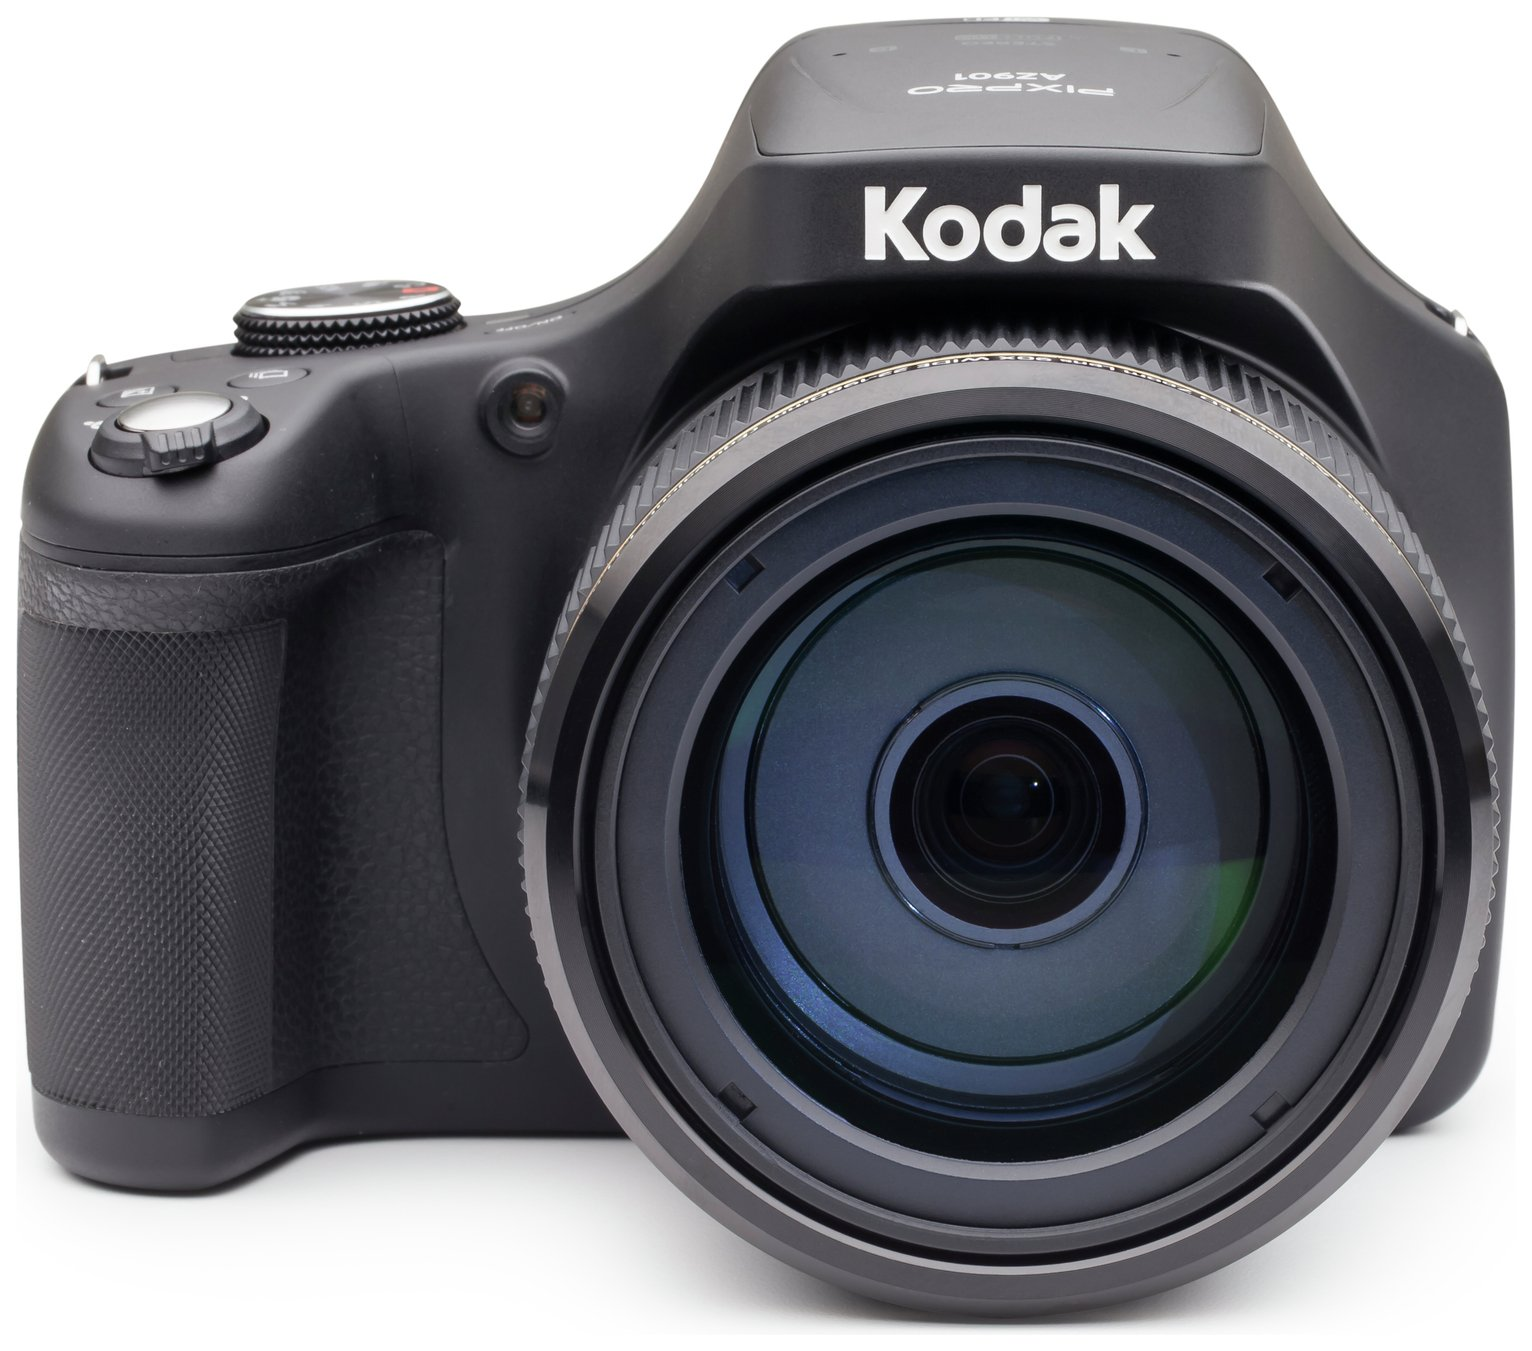 Image of Kodak Astro Zoom PixPro AZ901 20MP 90x Zoom Bridge Camera